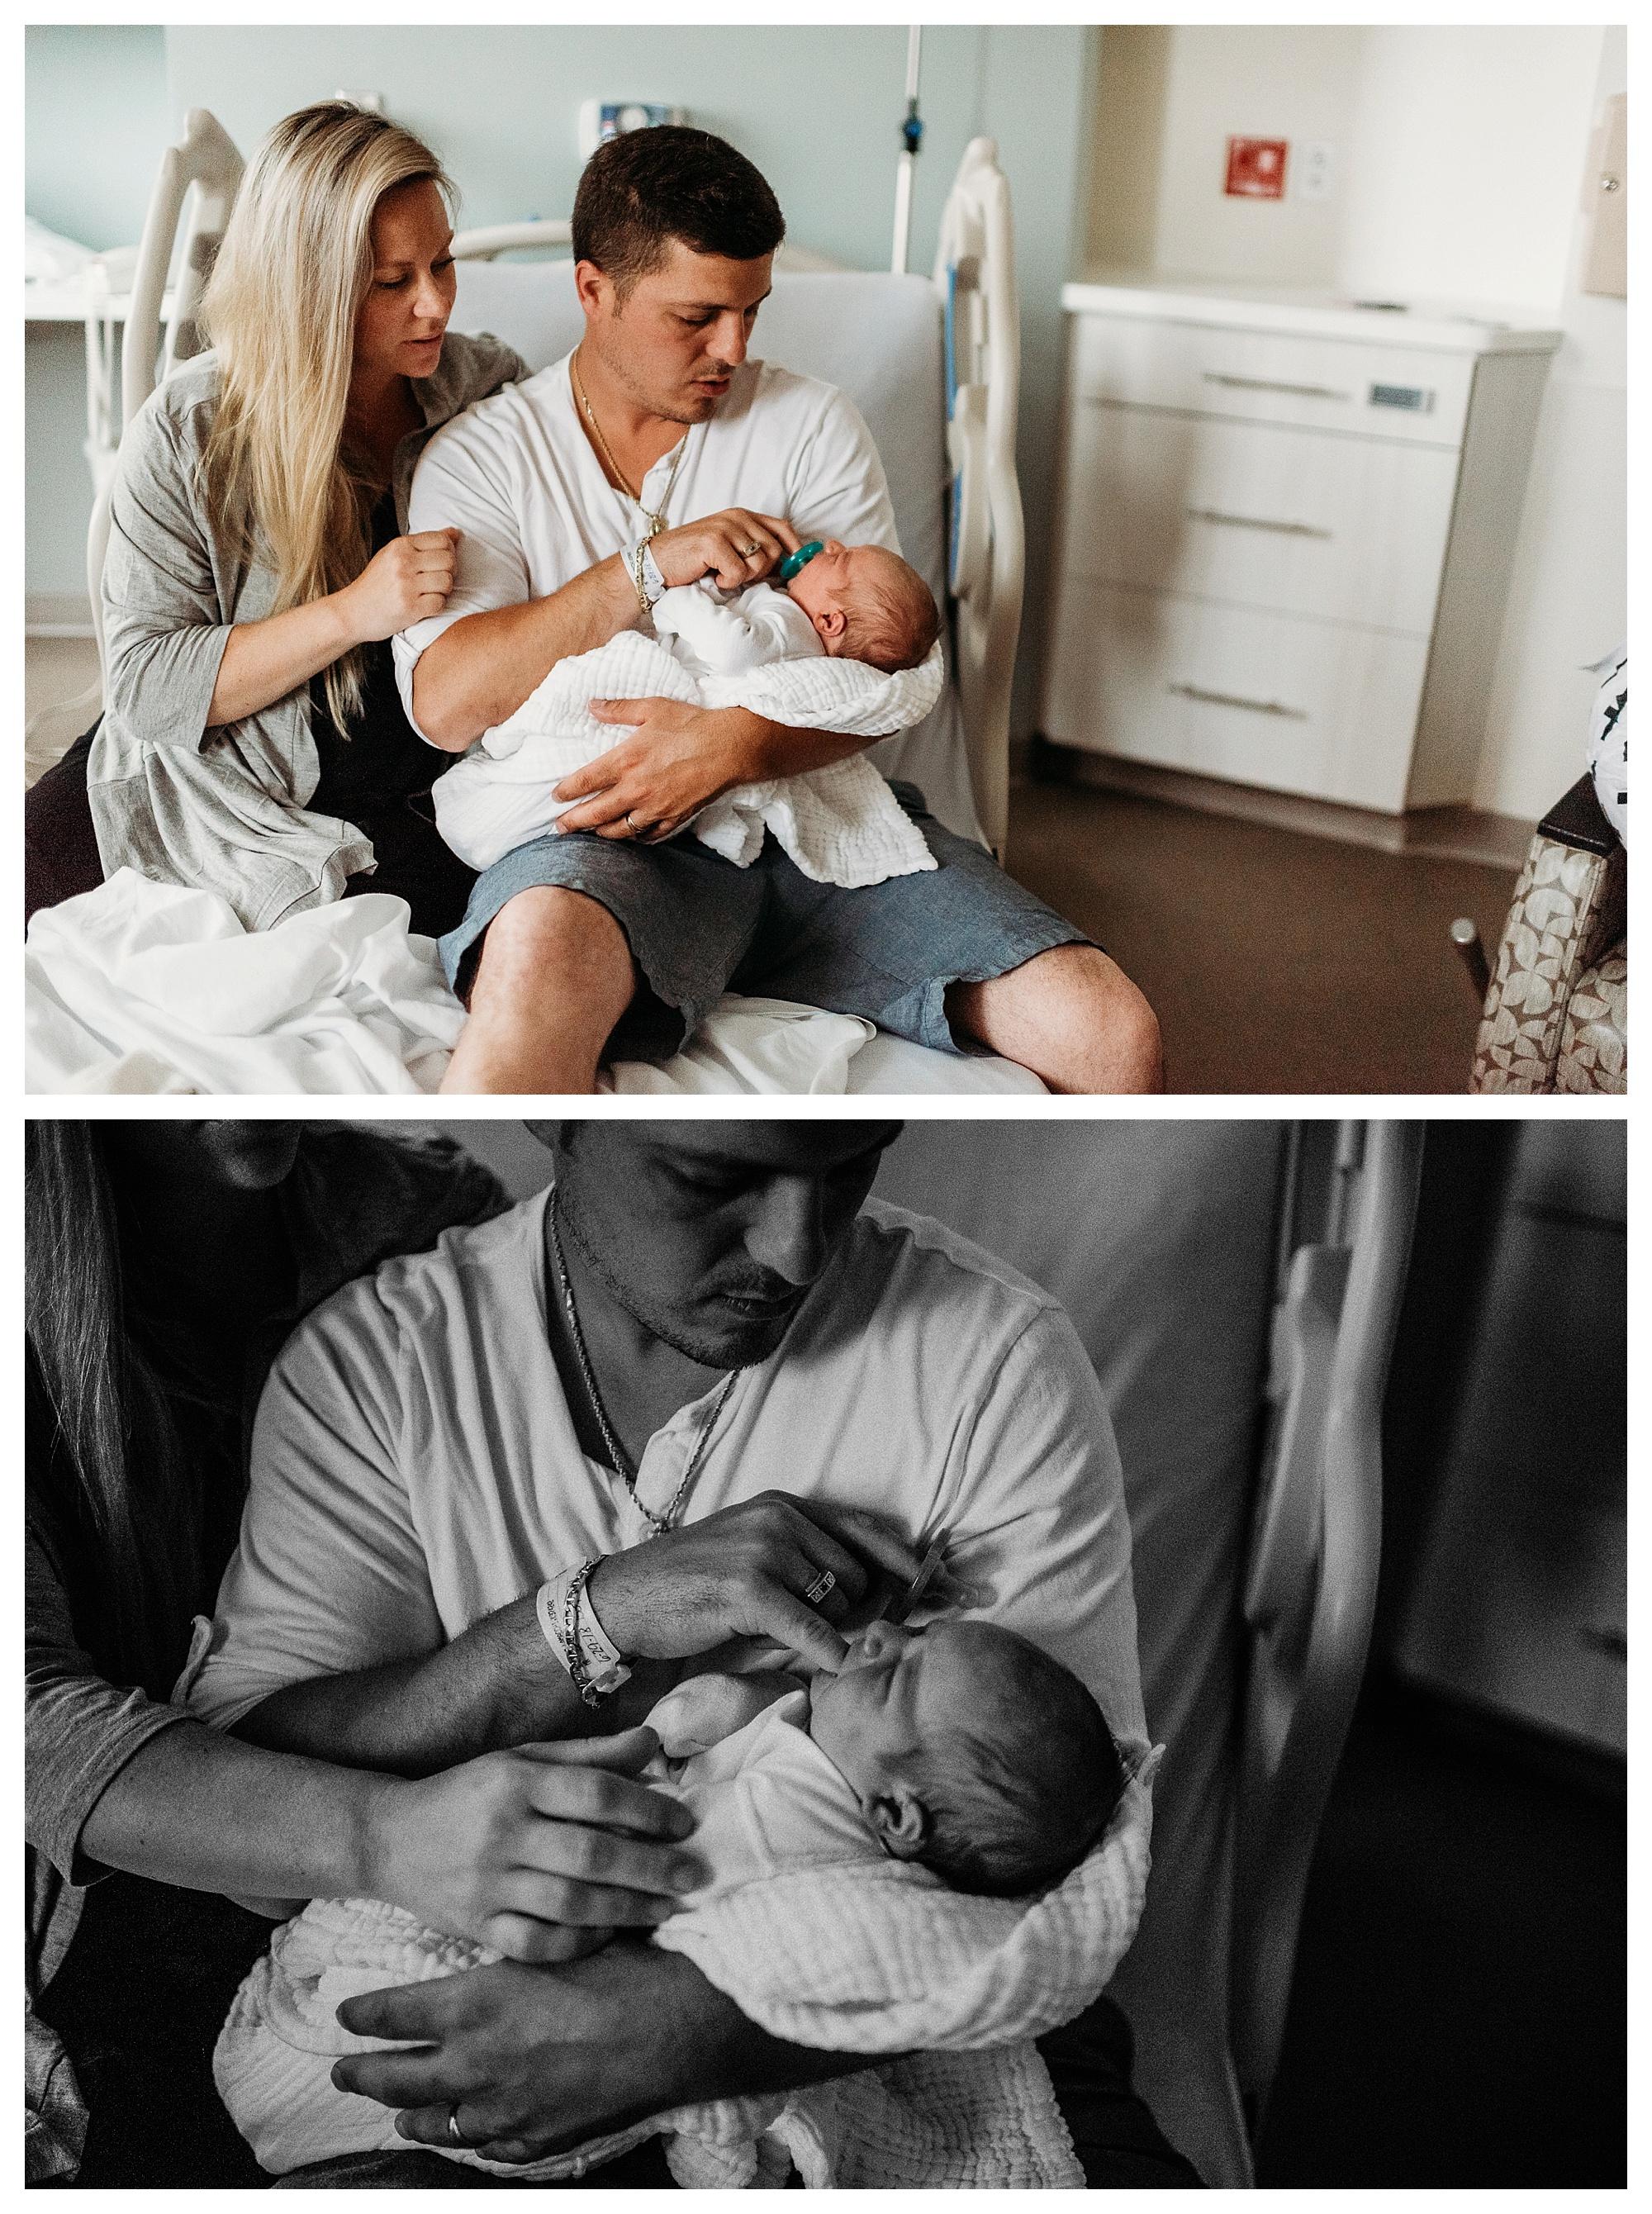 fresh 48, newborn, photographer, family photographer, newborn photographer, lake county illinois, milwaukee wisconsin, hospital photos, lifestyle